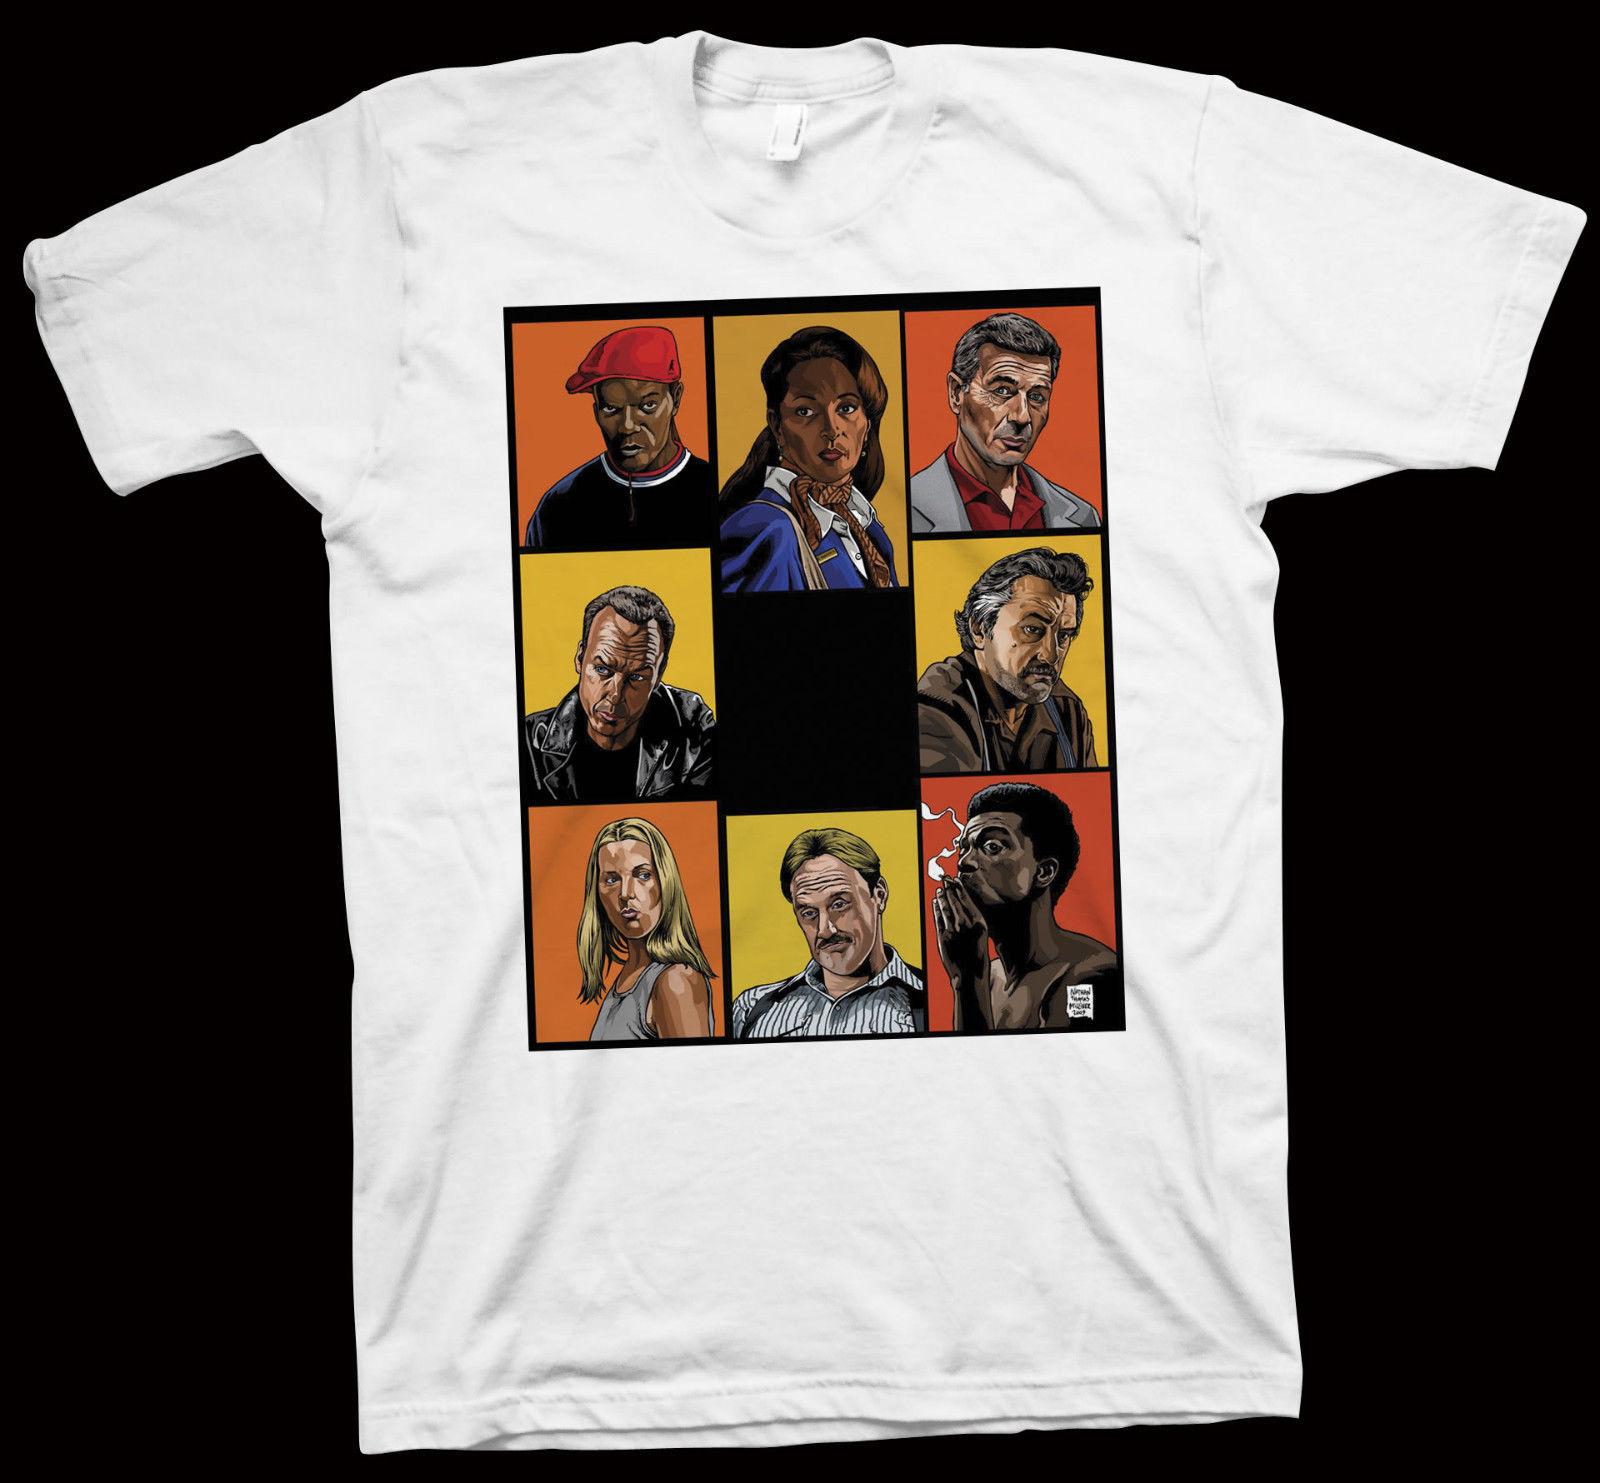 jackie-brown-t-shirt-quentin-font-b-tarantino-b-font-pam-grier-samuel-l-jackson-cinema-film-fashion-short-sleeve-sale-100-cotton